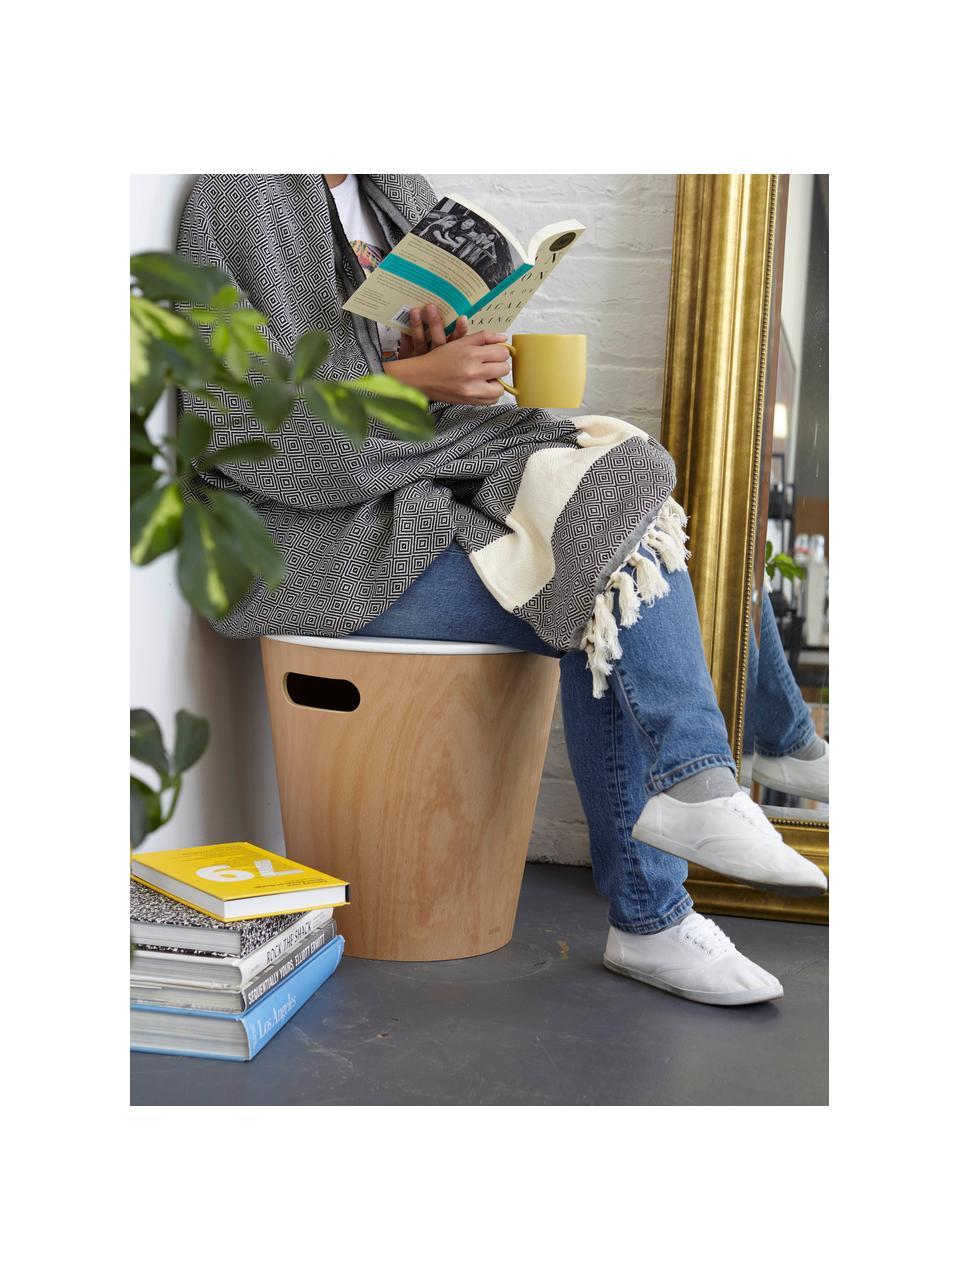 Kruk/bijzettafel Woodrow met opbergruimte, Gelakt hout, Houtkleurig, wit, Ø 41 x H 42 cm